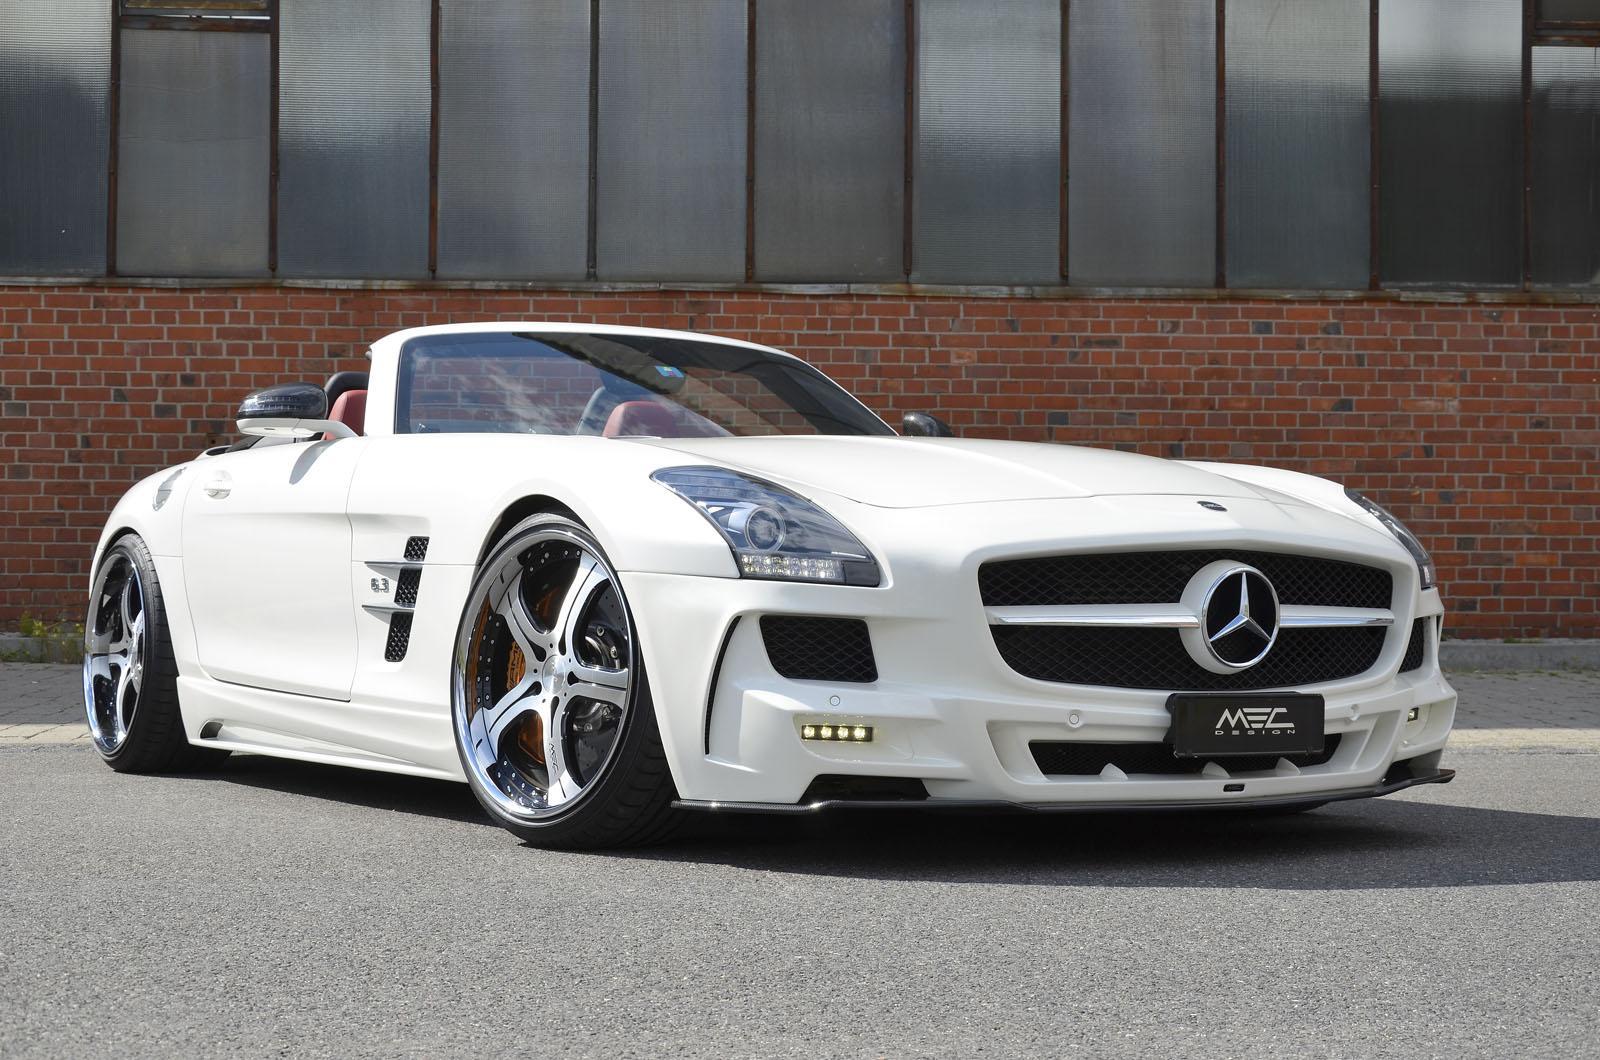 Mercedes benz sls amg roadster by mec design autoevolution for Mercedes benz roadster amg